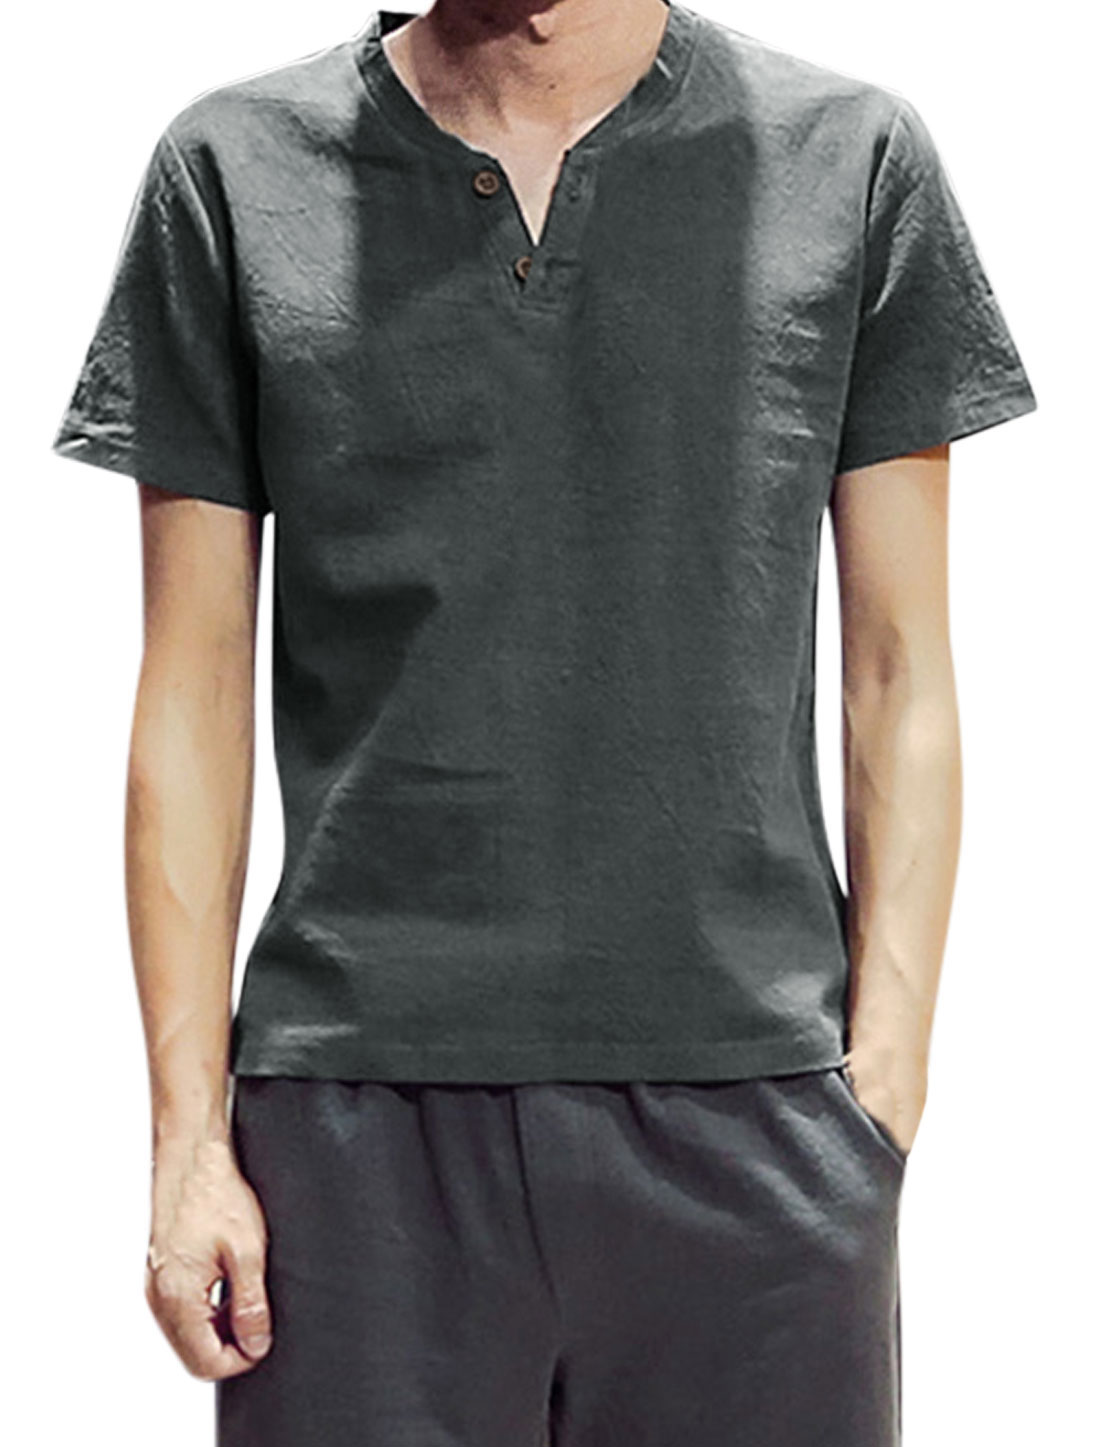 Men Split Neck Two Button Closed Upper Short Sleeves Linen Tee Dark Gray M